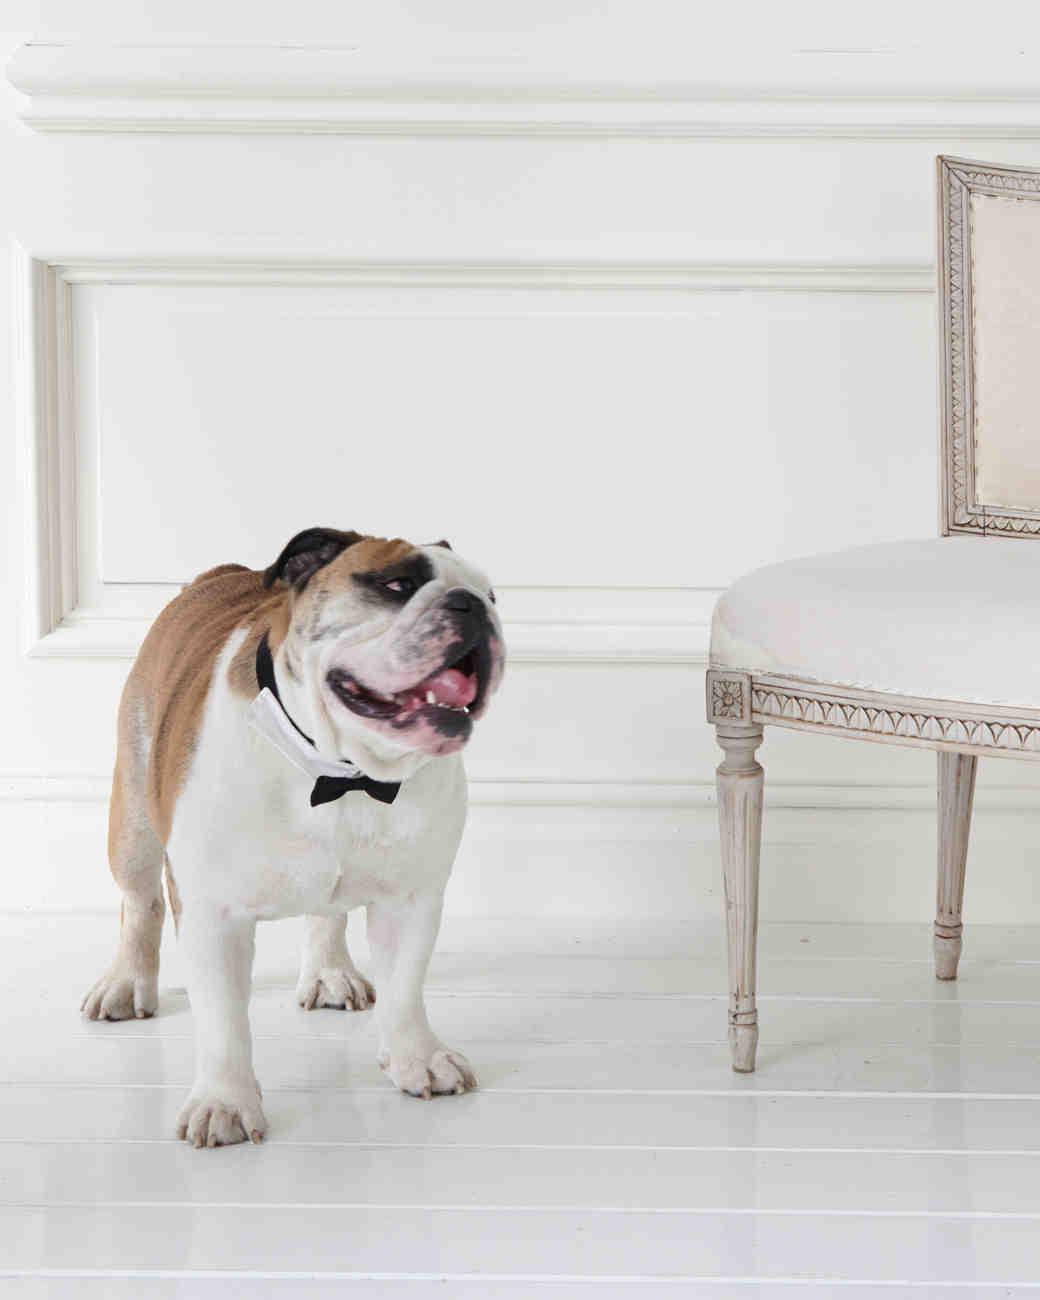 wedding-pet-clothes-mspets-wedding-bowtie-collar-bulldog-0515.jpg